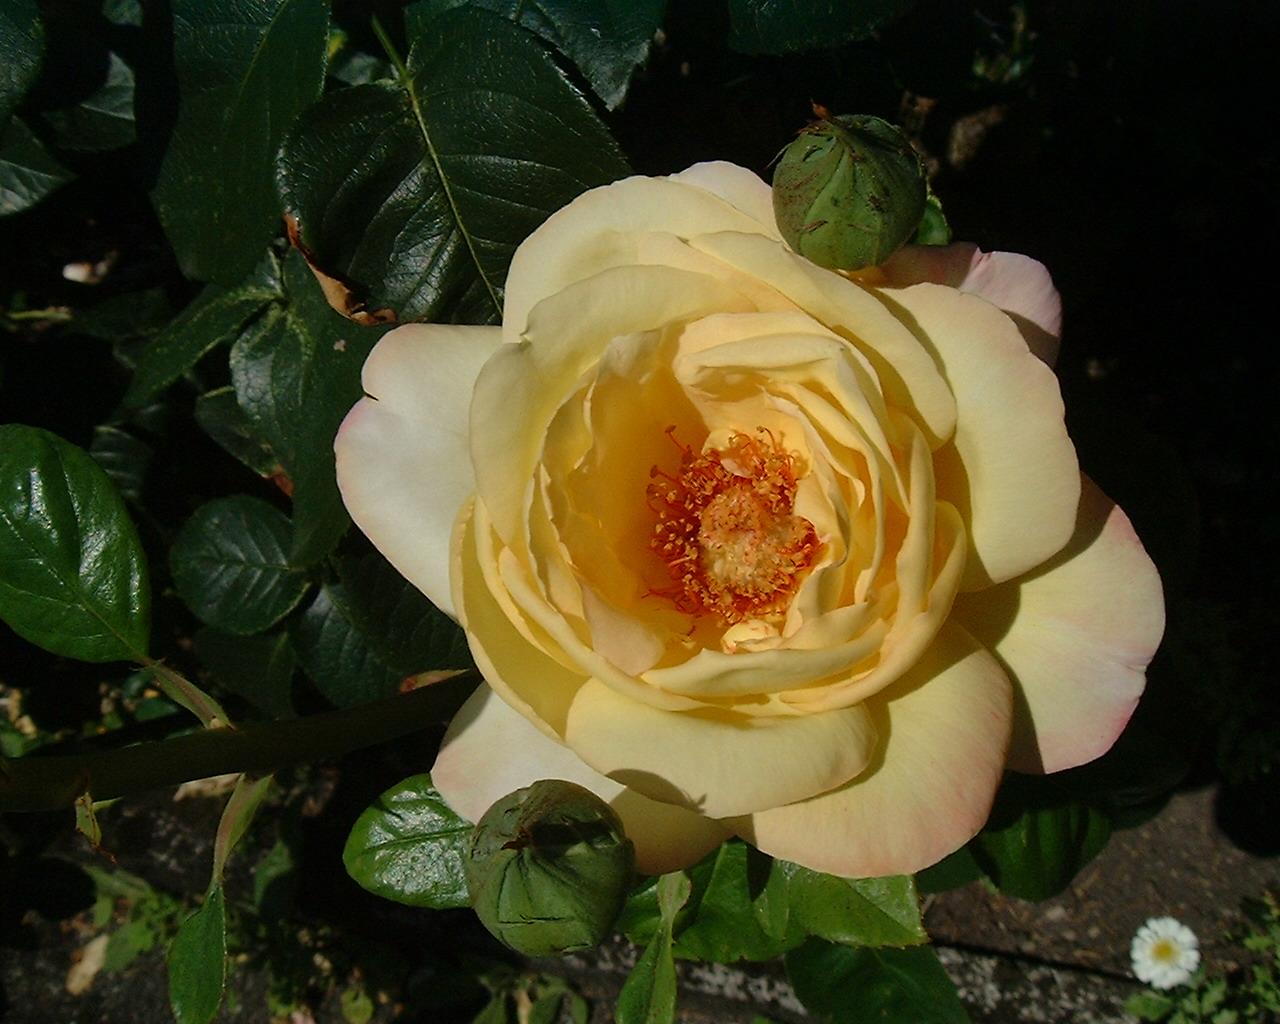 Rose 2 RG